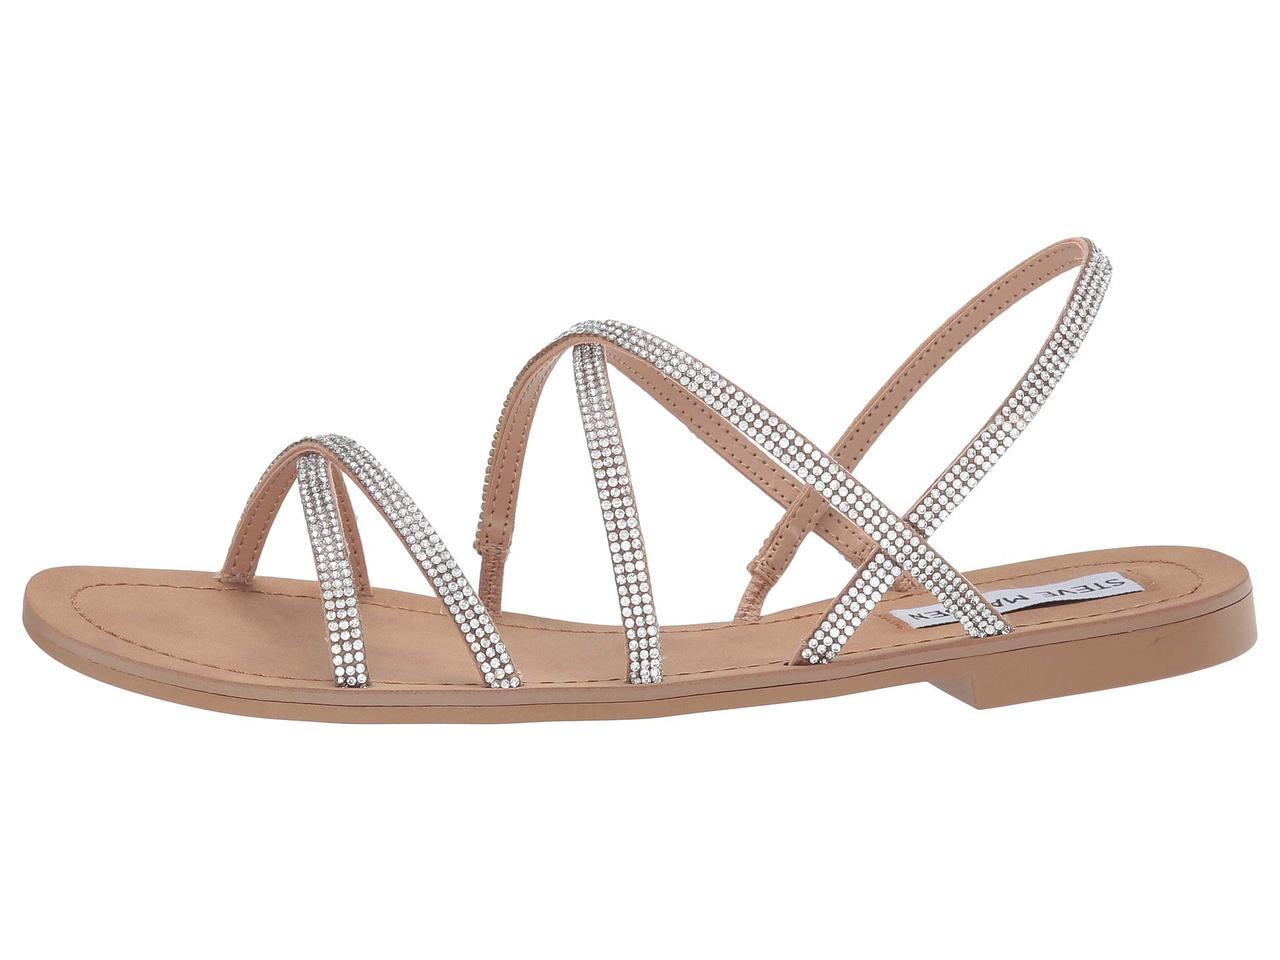 3059d041a46 Сандали/Вьетнамки (Оригинал) Steve Madden Rita Flat Sandals Natural Multi